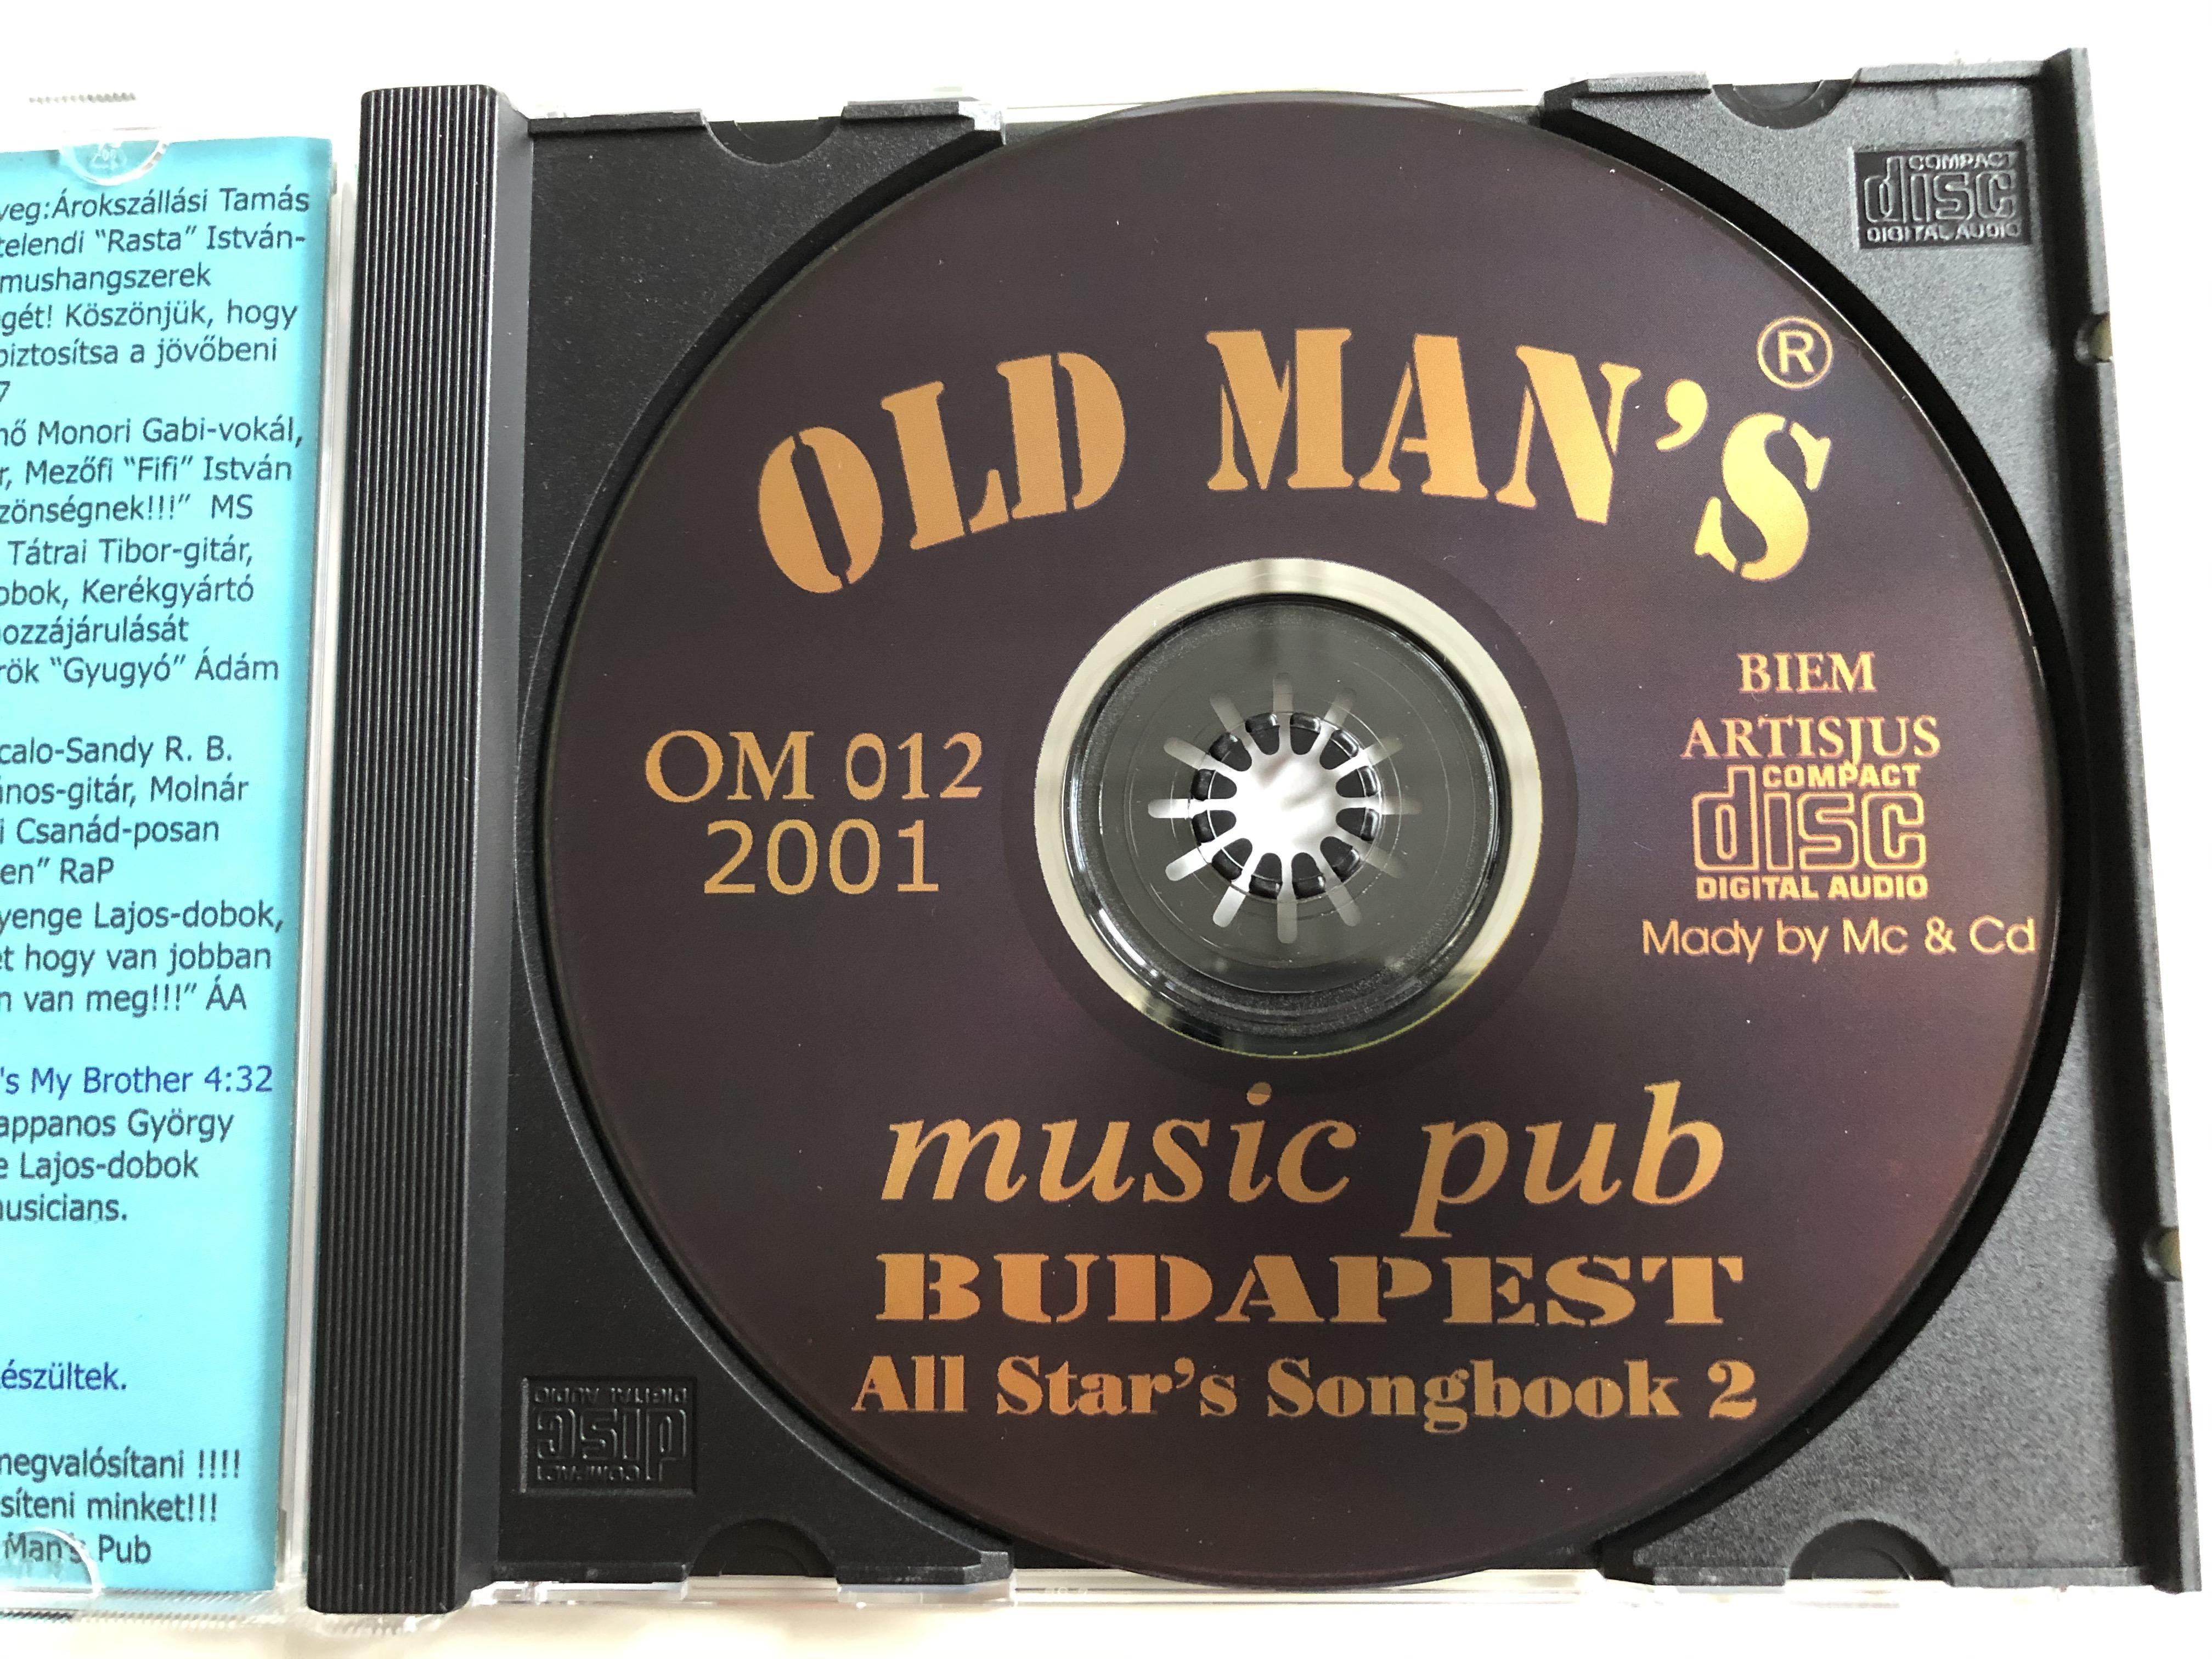 old-man-s-music-pub-budapest-all-star-s-songbook-2-tatrai-hebo-mucki-adi-fero-bill-old-man-s-records-audio-cd-2001-om-012-6-.jpg